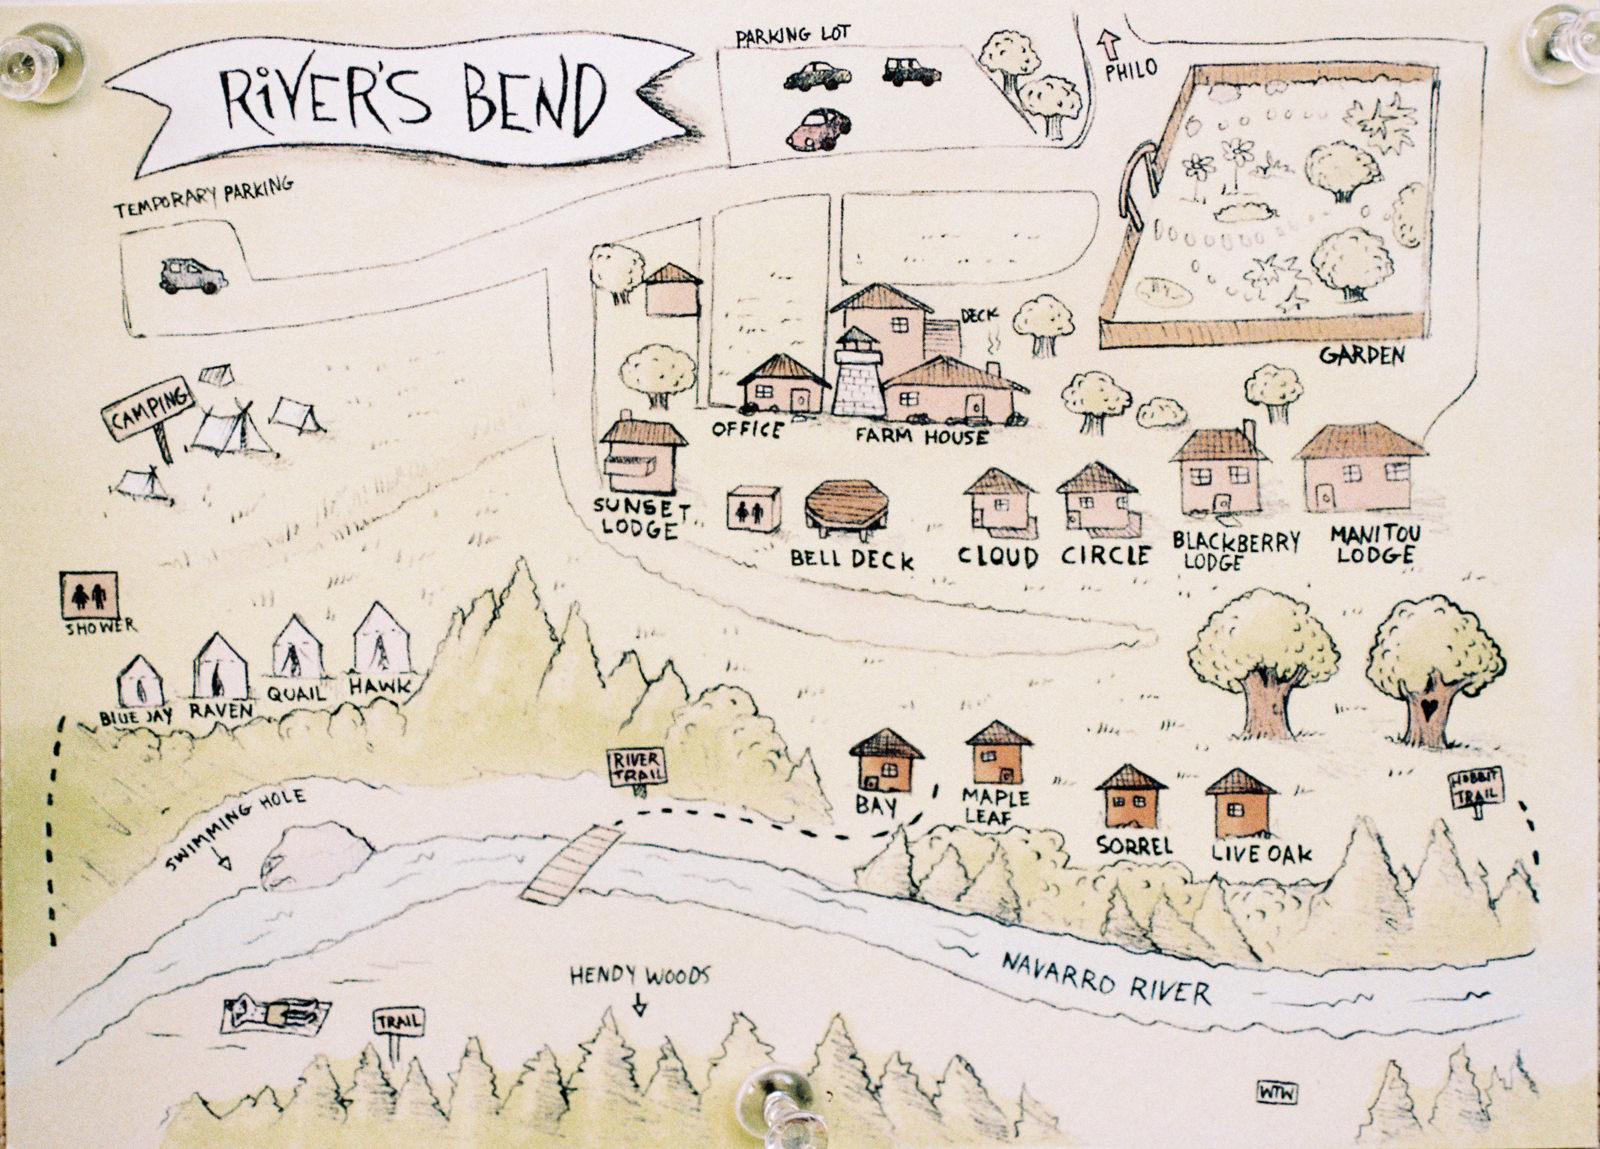 rivers-bend-retreat-wedding-002 RIVER'S BEND RETREAT WEDDING